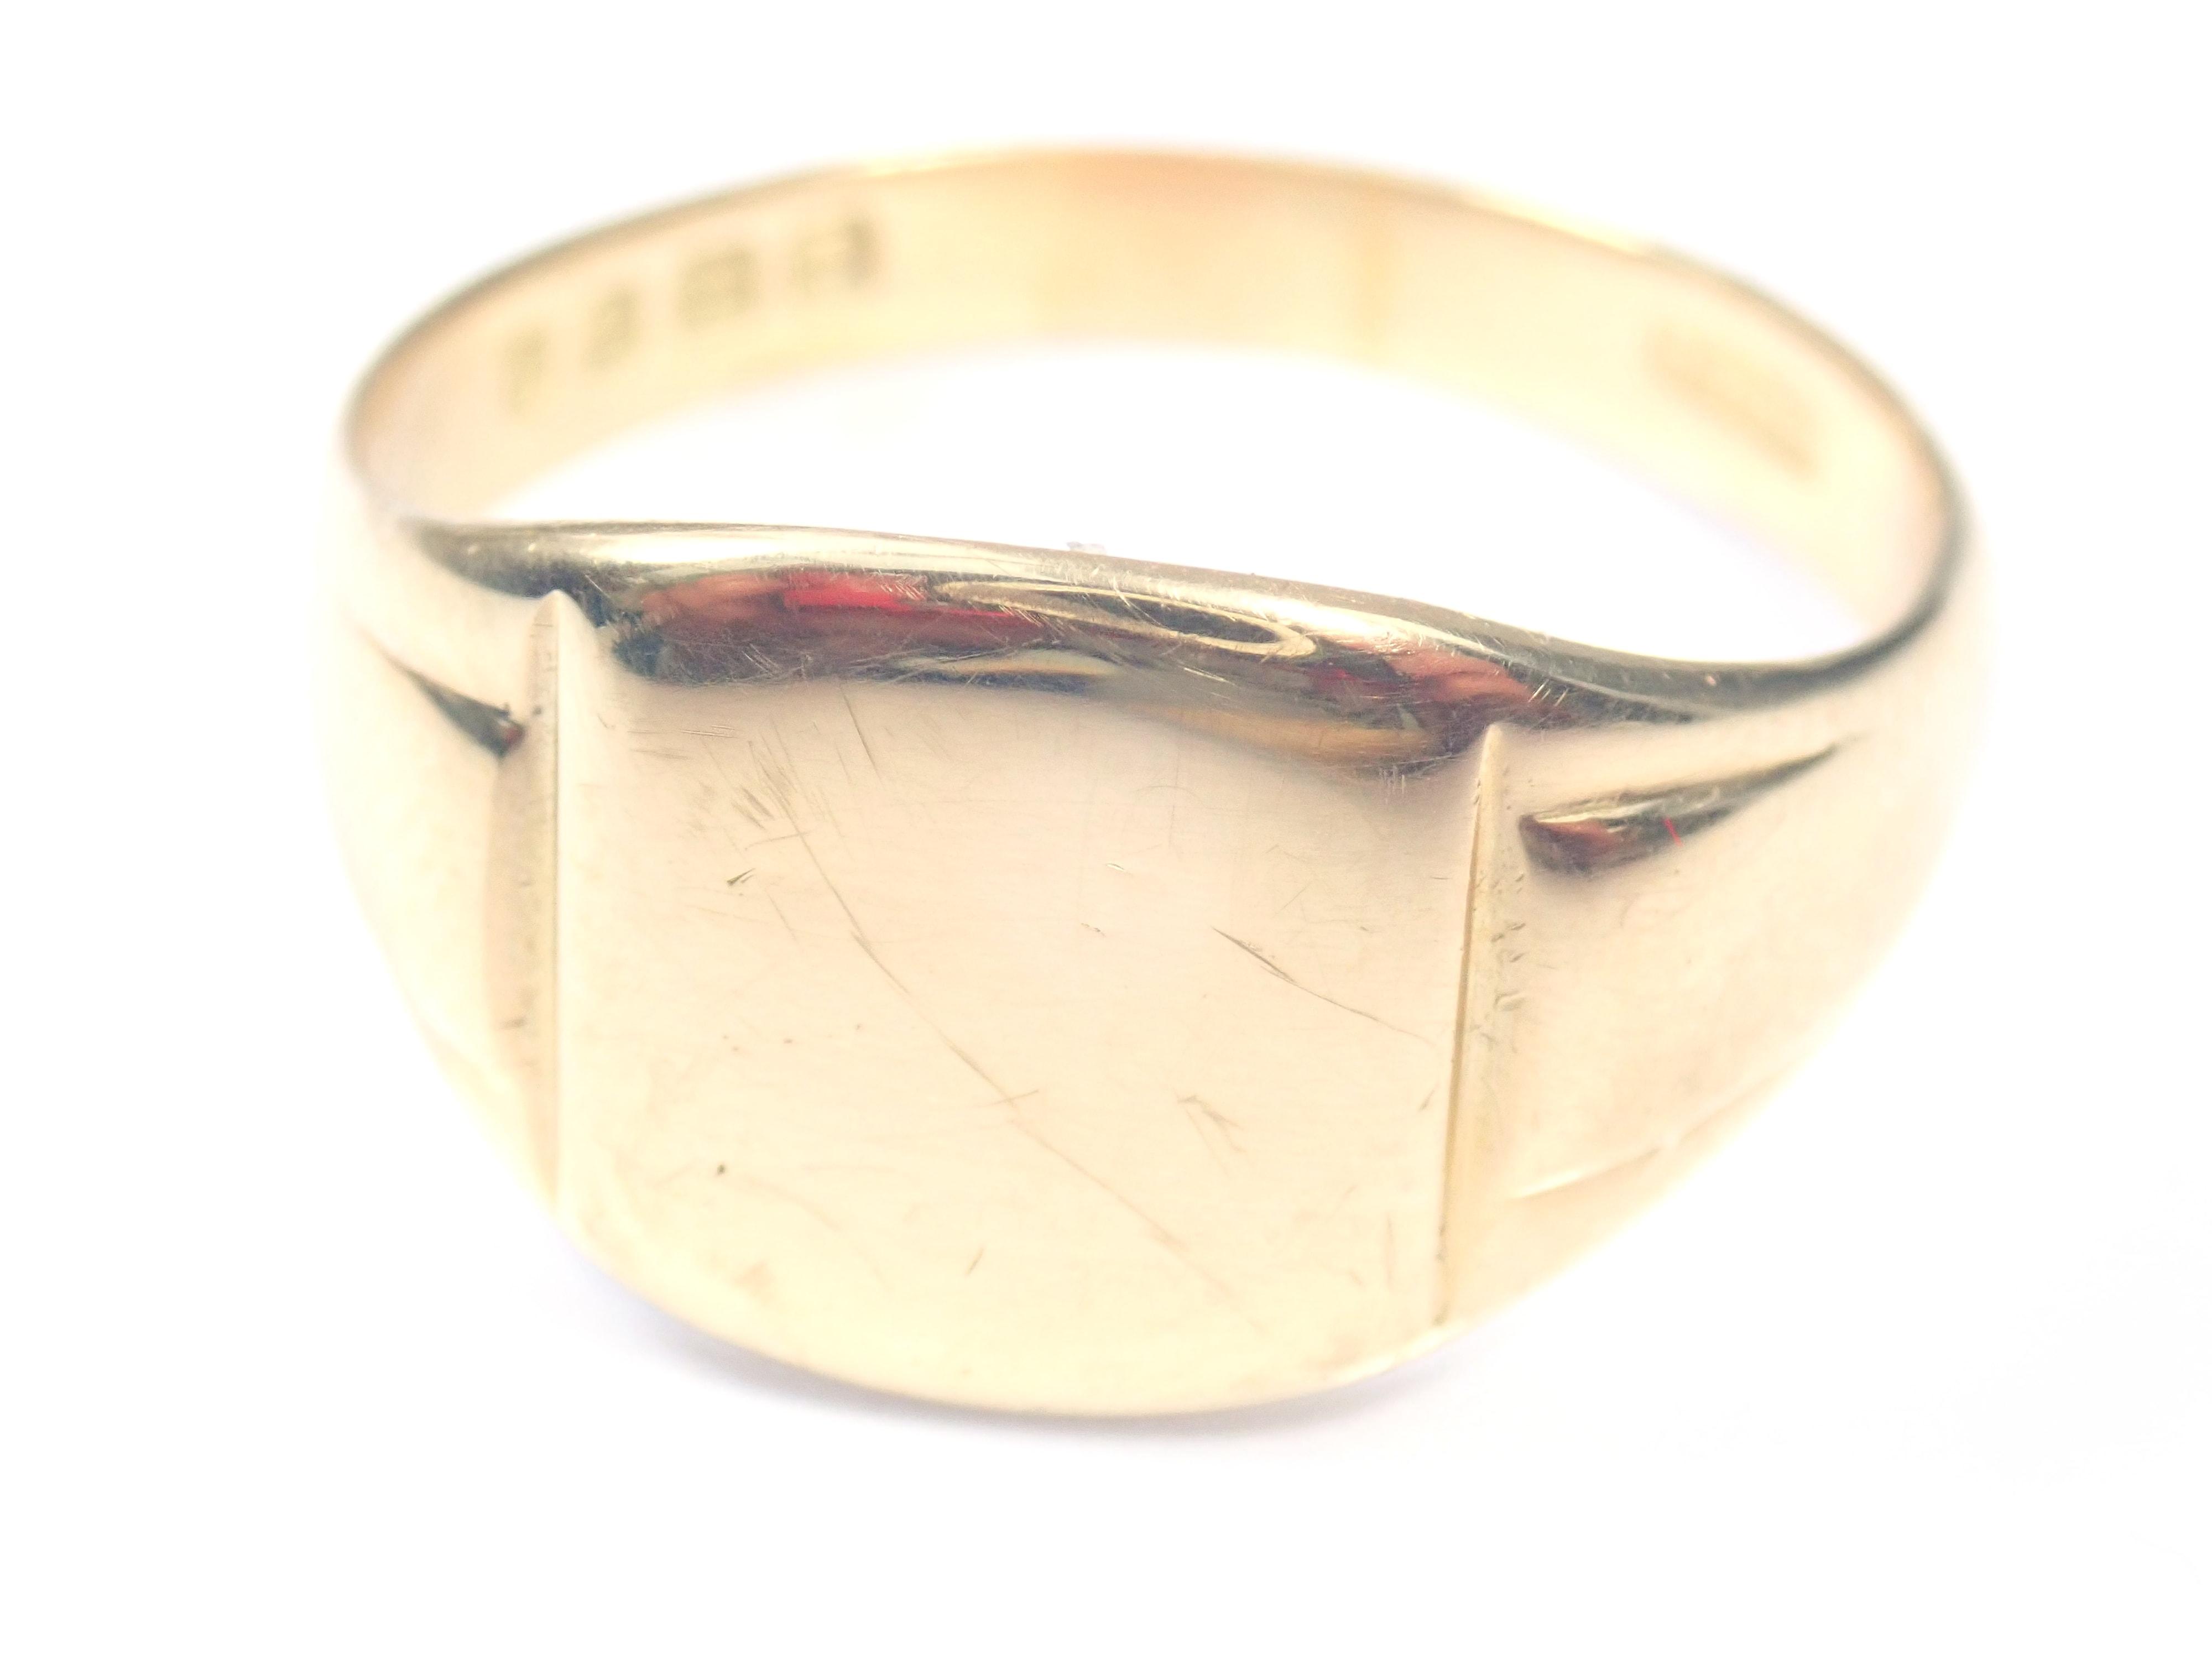 AZZ00873 1 - Beautiful!! Vintage Shield Solid 18 carat Gold Signet Ring - Size V - 6.95gms #150